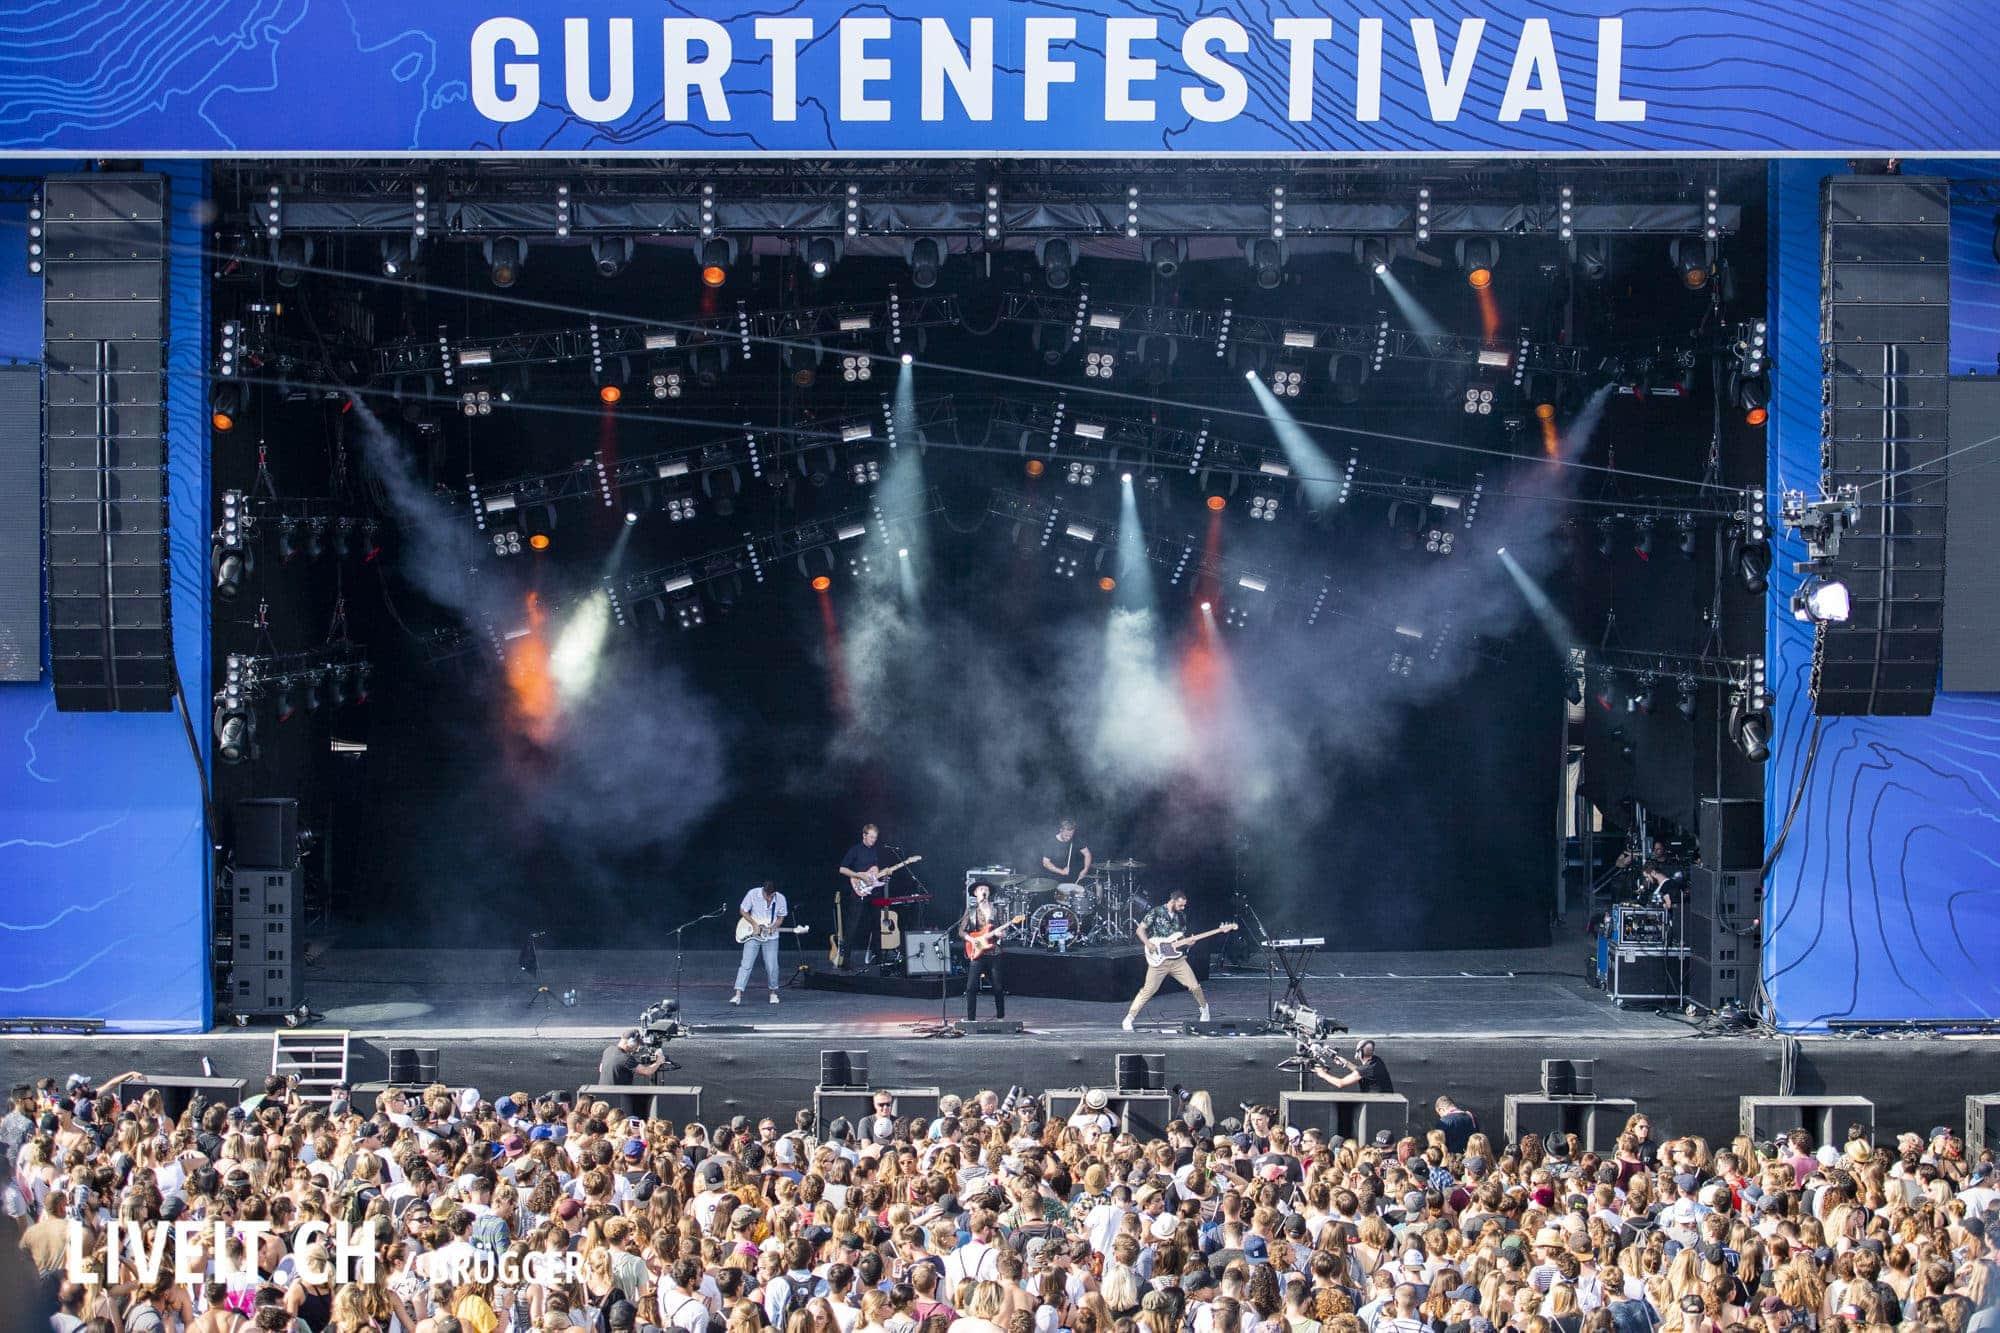 Two Door Cinema Club Gurtenfestival 2018 in Bern. (Dominic Bruegger for Gurtenfestival)